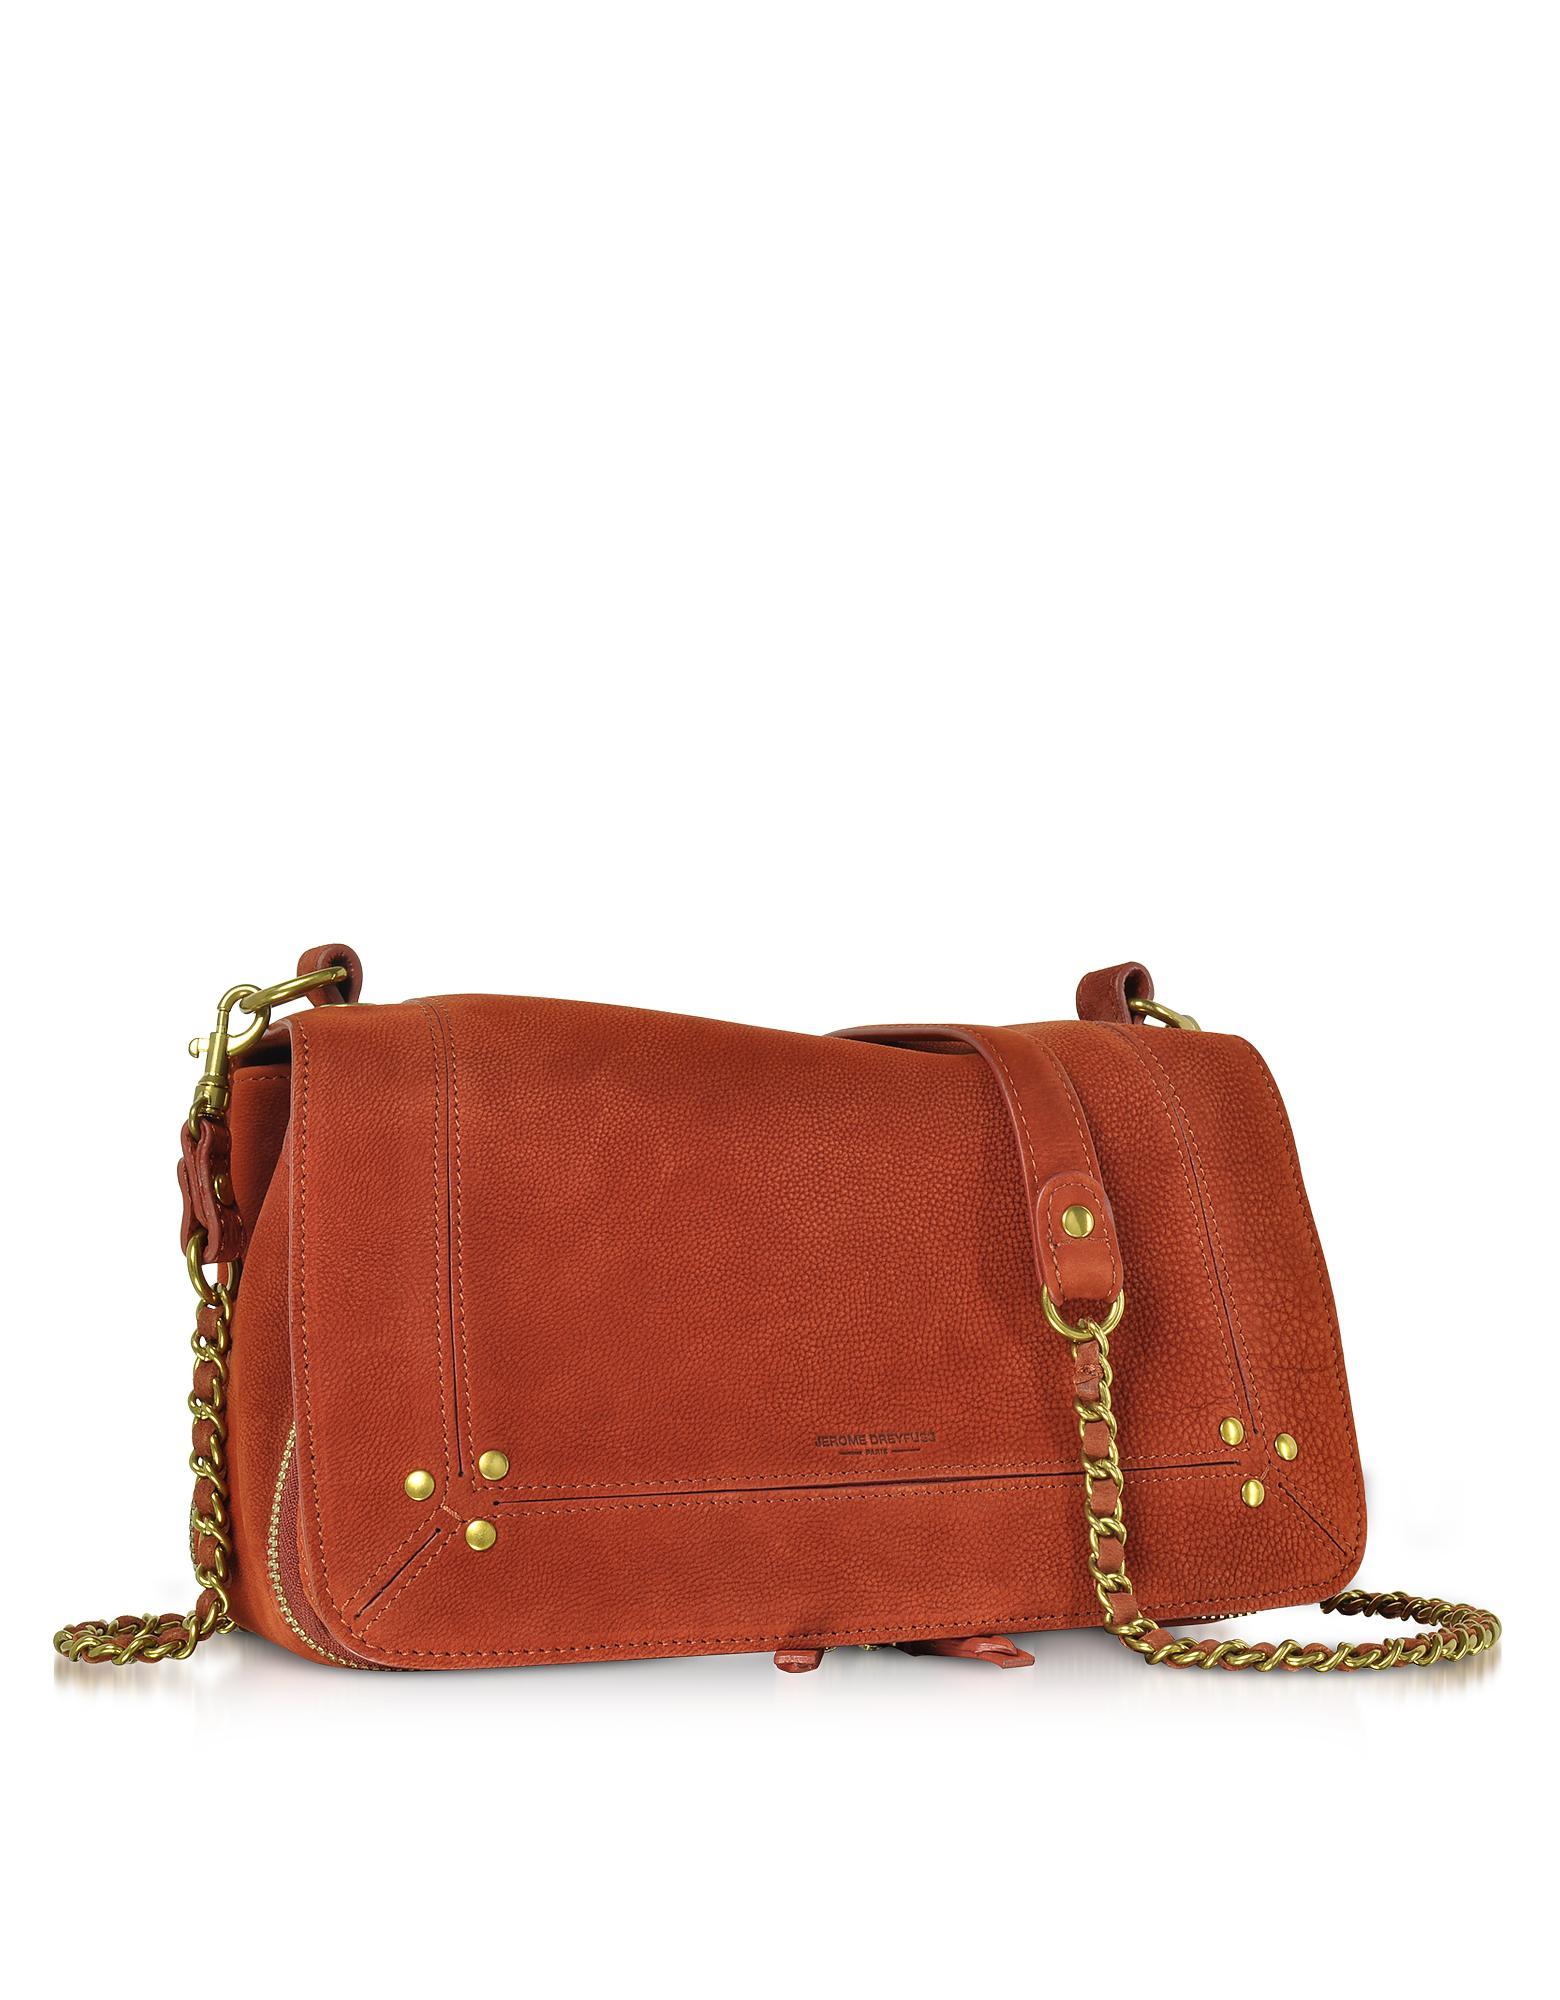 Jerome Dreyfuss Pre-owned - Bobi leather handbag bnPDTyfB